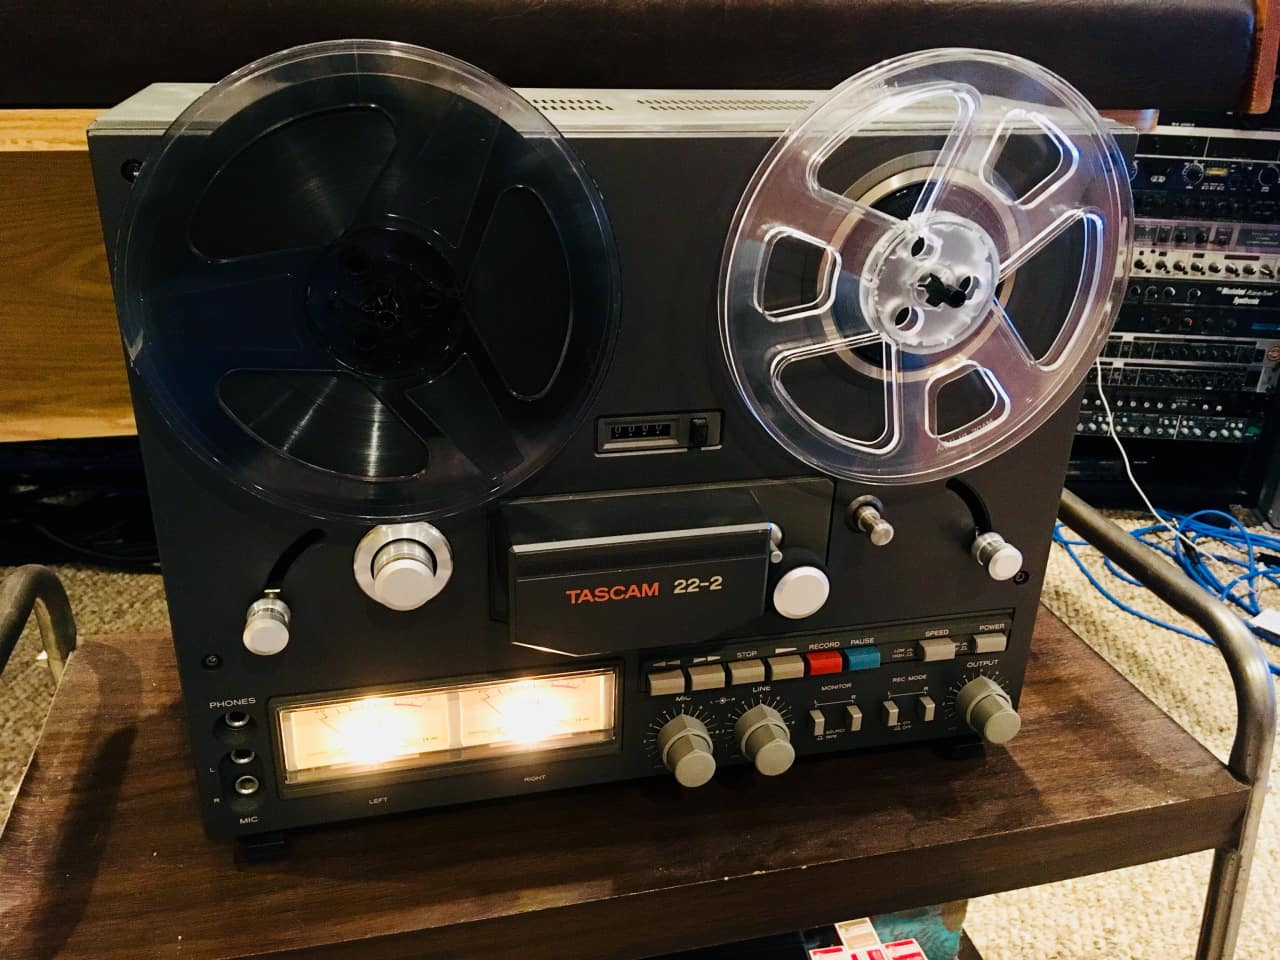 Art Line Level Converter : Tascam 22 2 pro reel to 15 ips ⭐ tape machine w art reverb